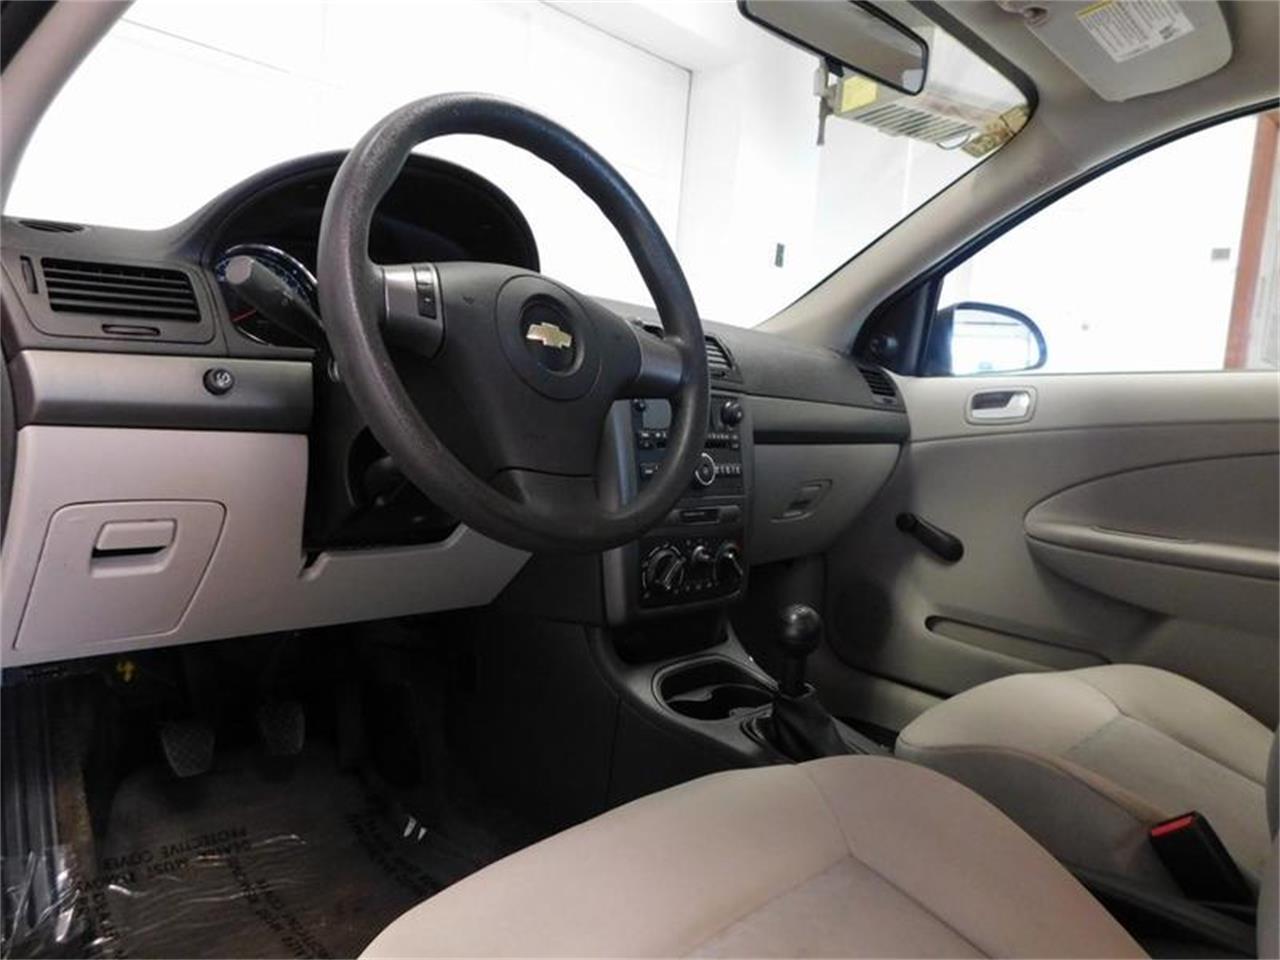 Large Picture of 2007 Chevrolet Cobalt - $3,999.00 - QEMW